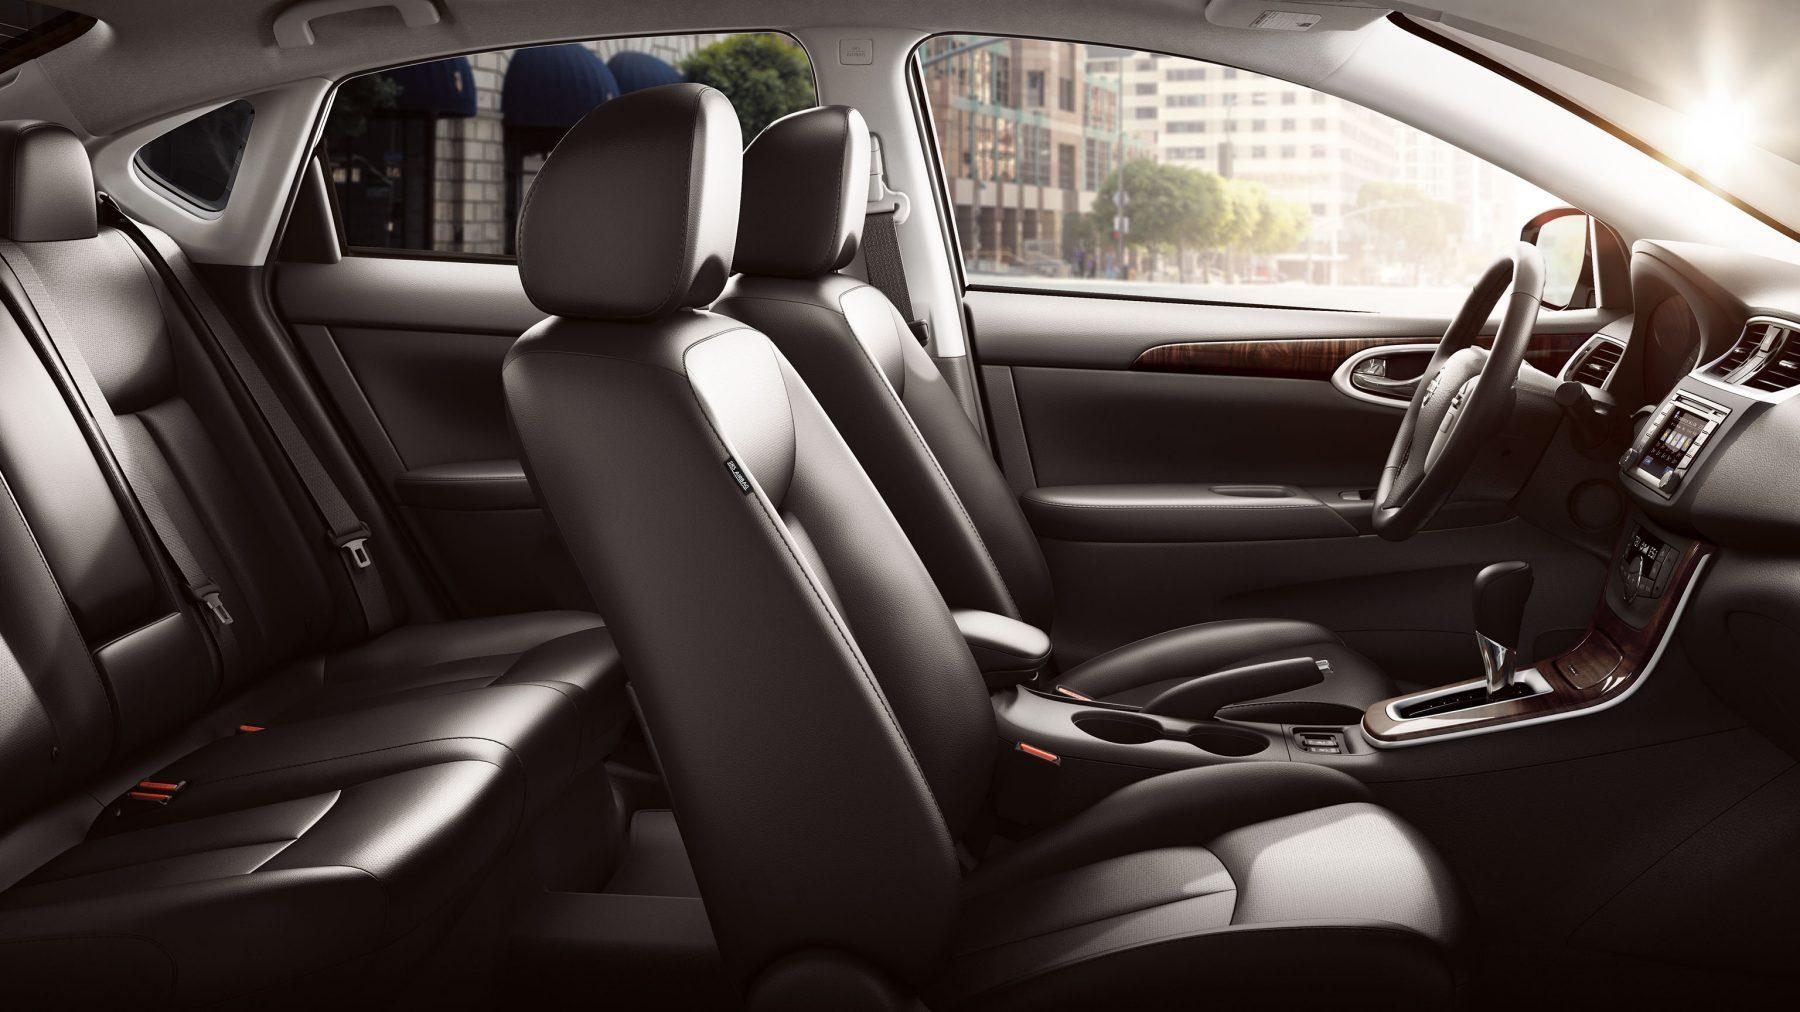 Nissan Sentra 2018, Saudi Arabia